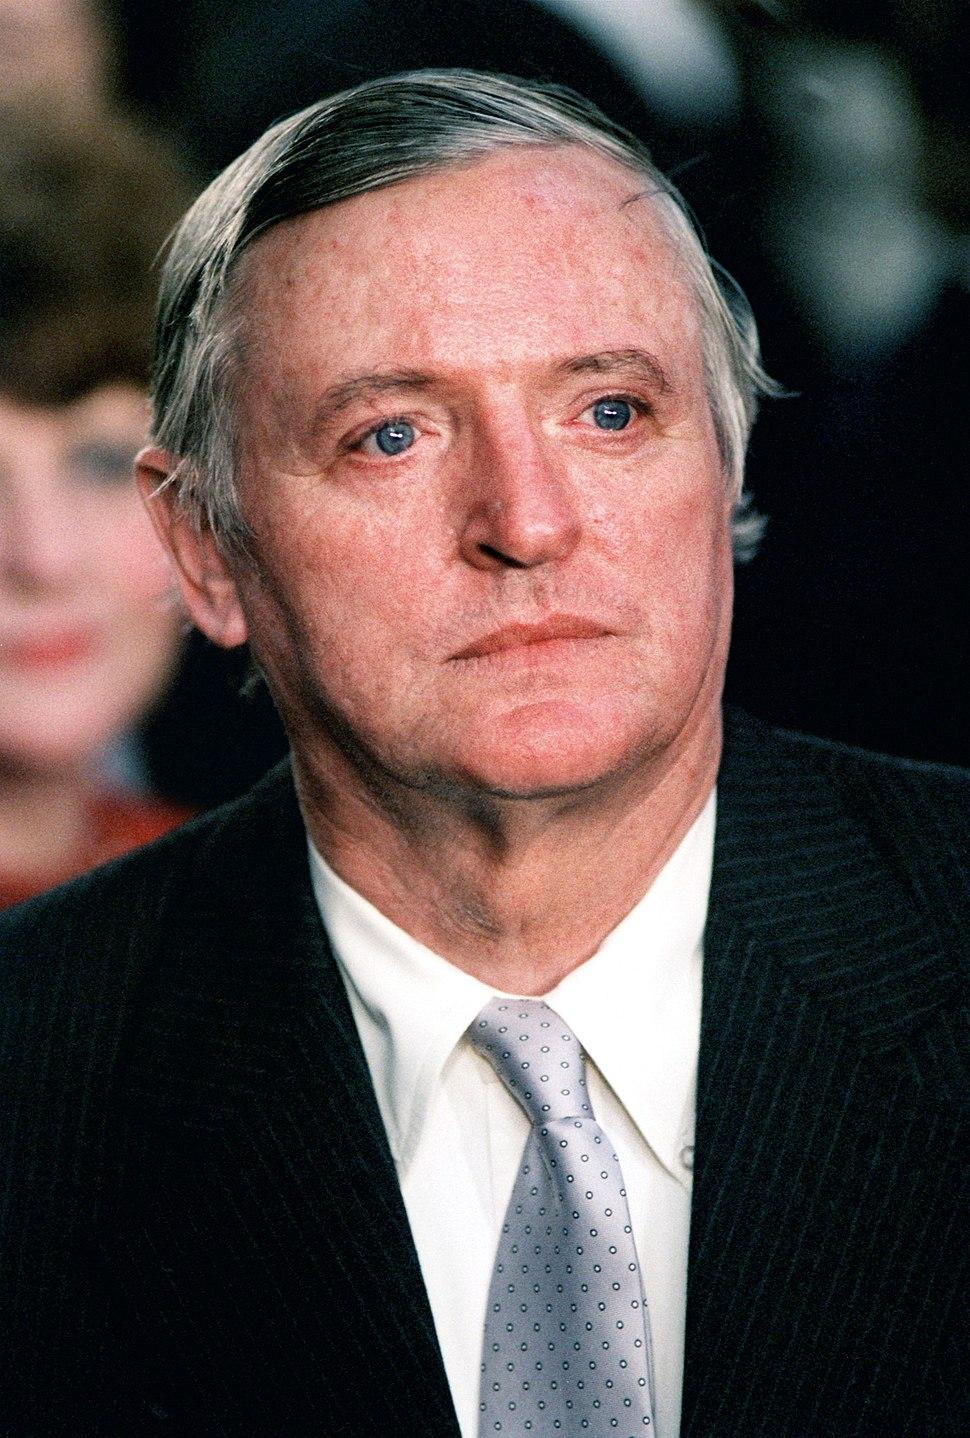 William F. Buckley, Jr. 1985